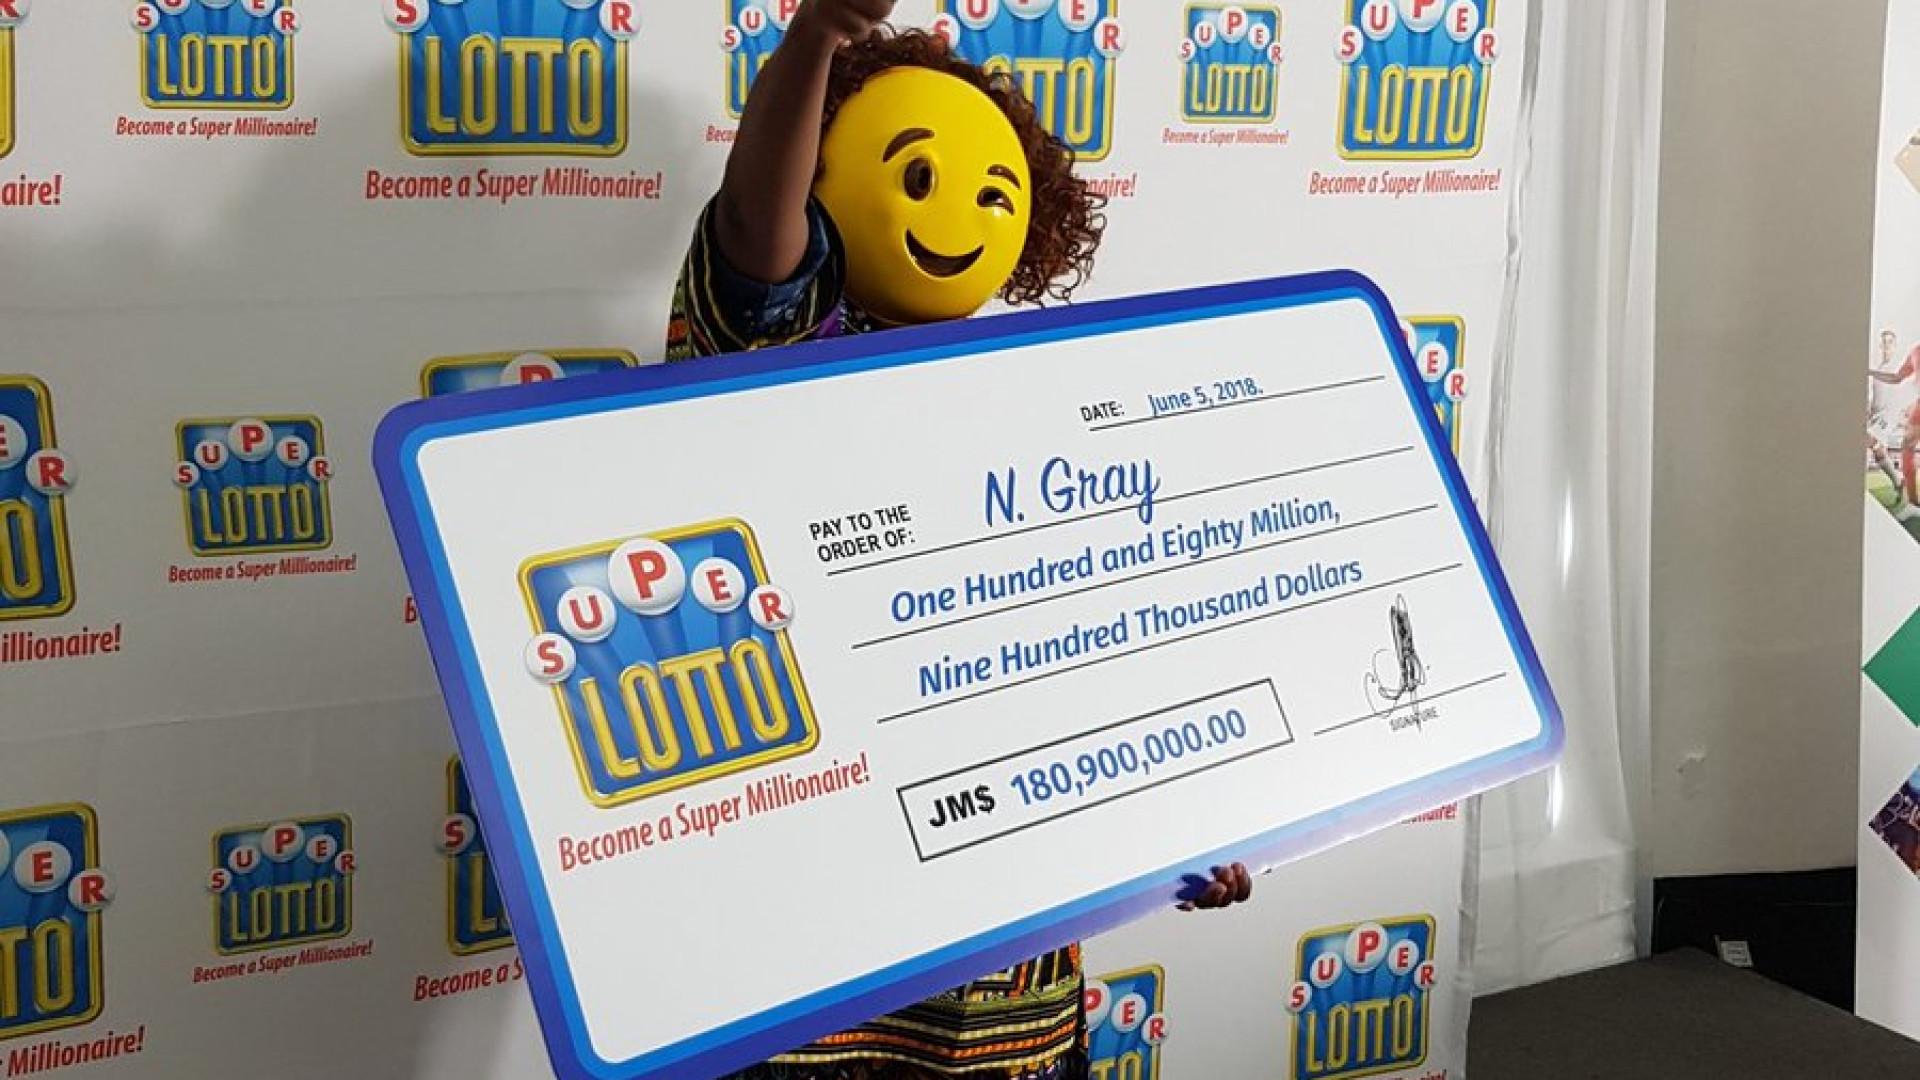 Vencedora de lotaria usa máscara de emoji para esconder identidade